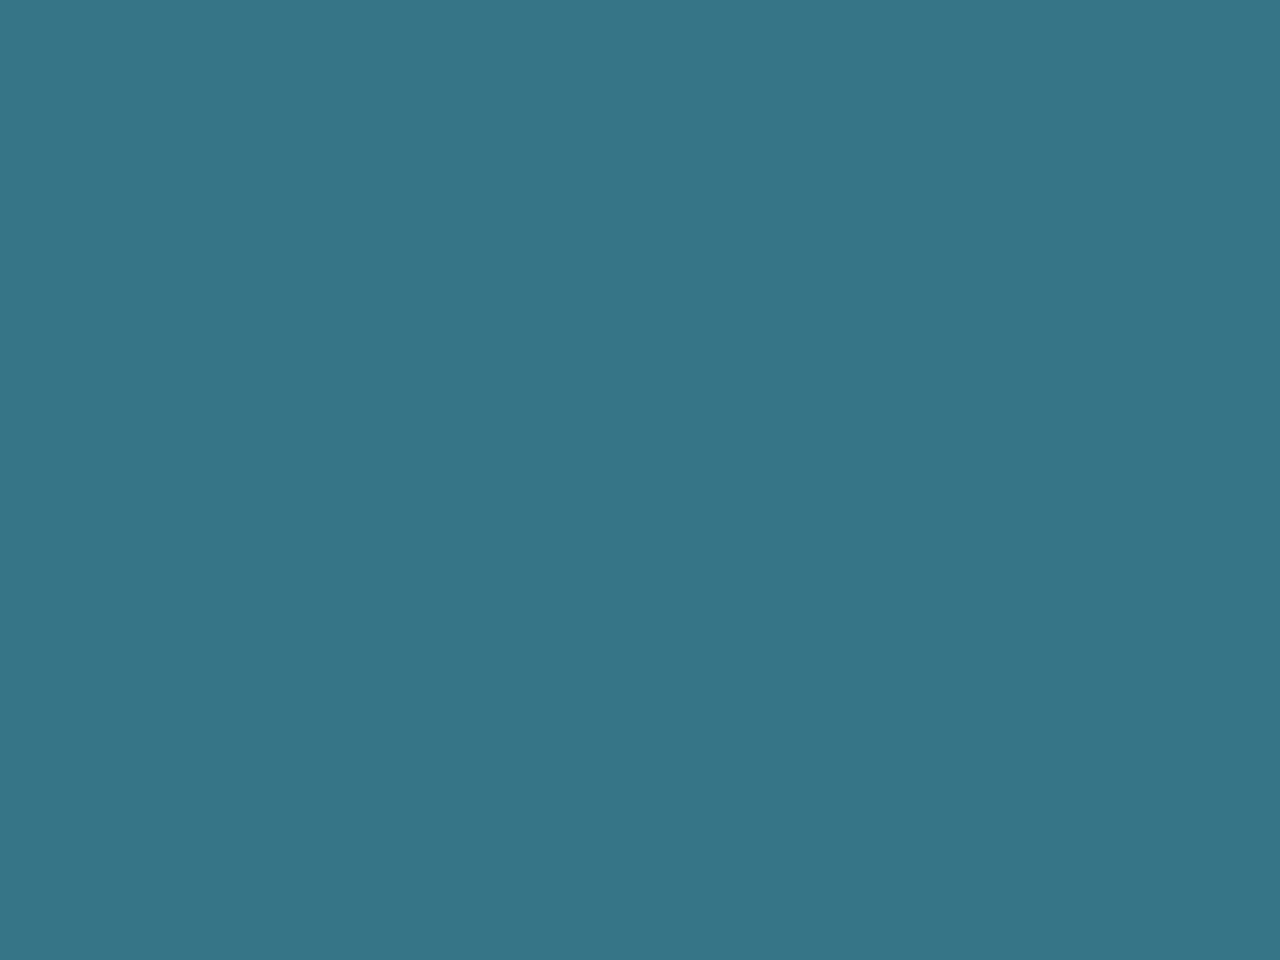 1280x960 Teal Blue Solid Color Background